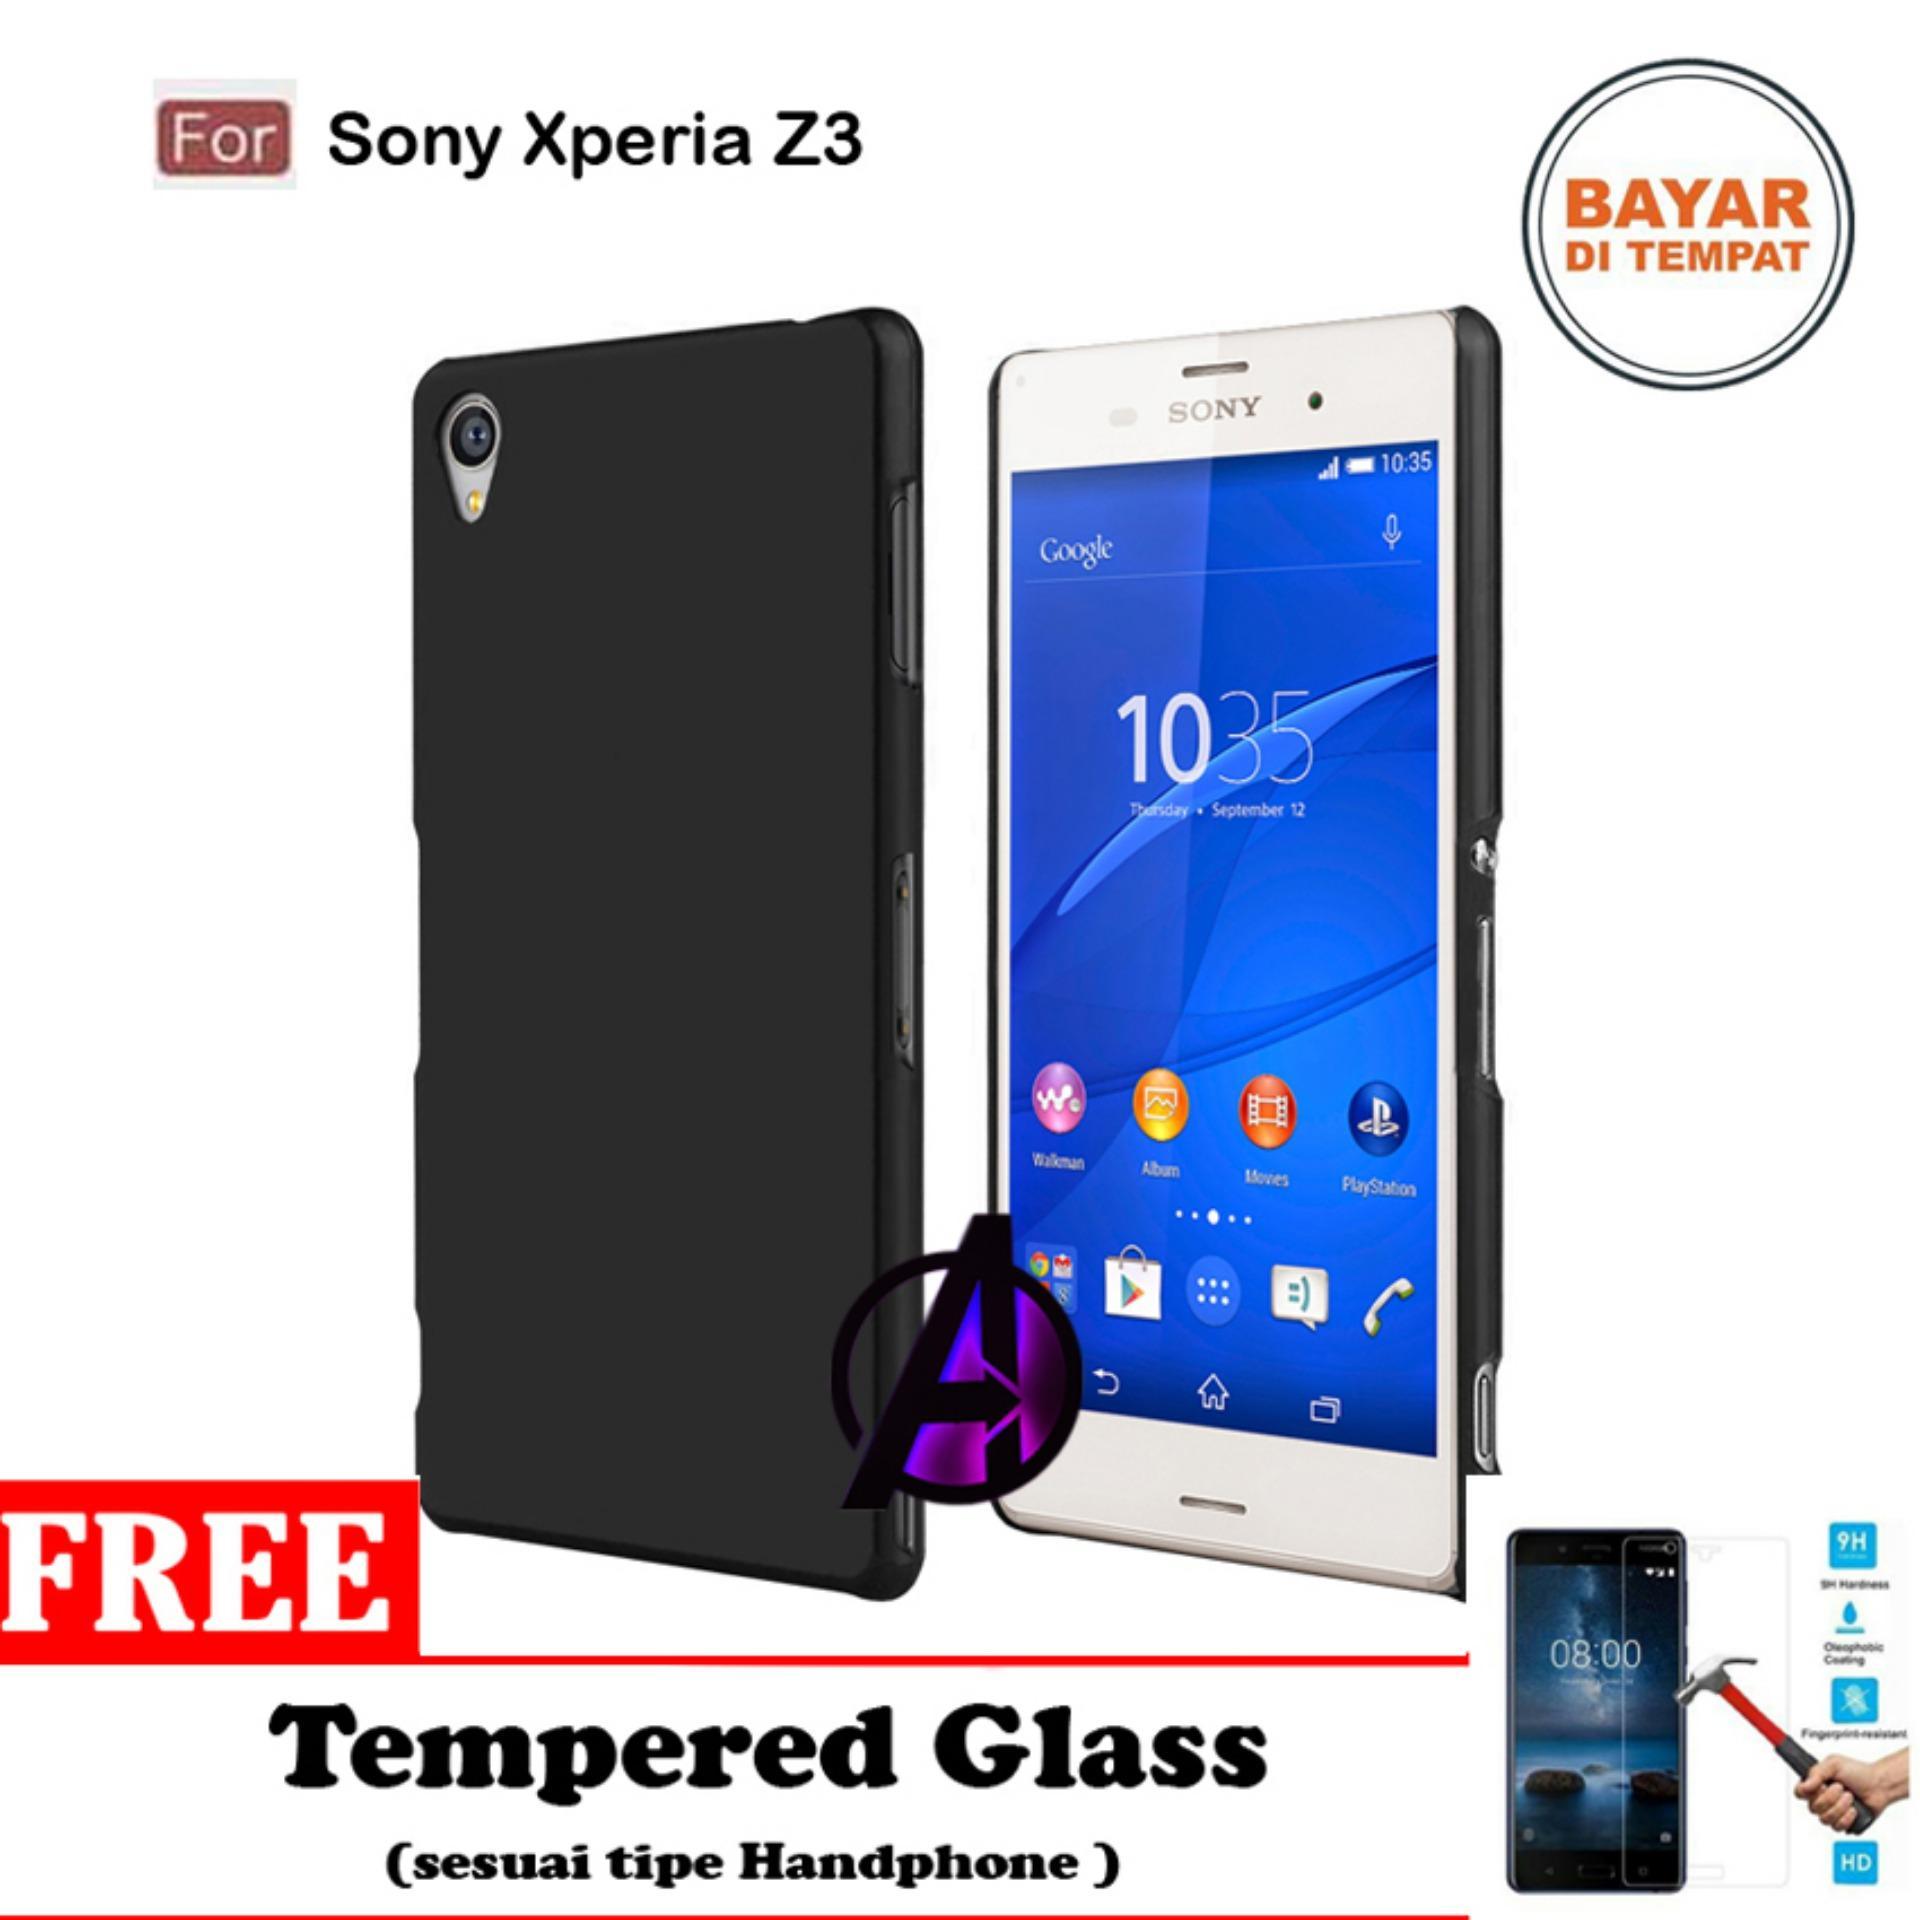 Case Matte Black Soft Slim Casing Handphone Sony Xperia Z3 - Free Tempered Glass